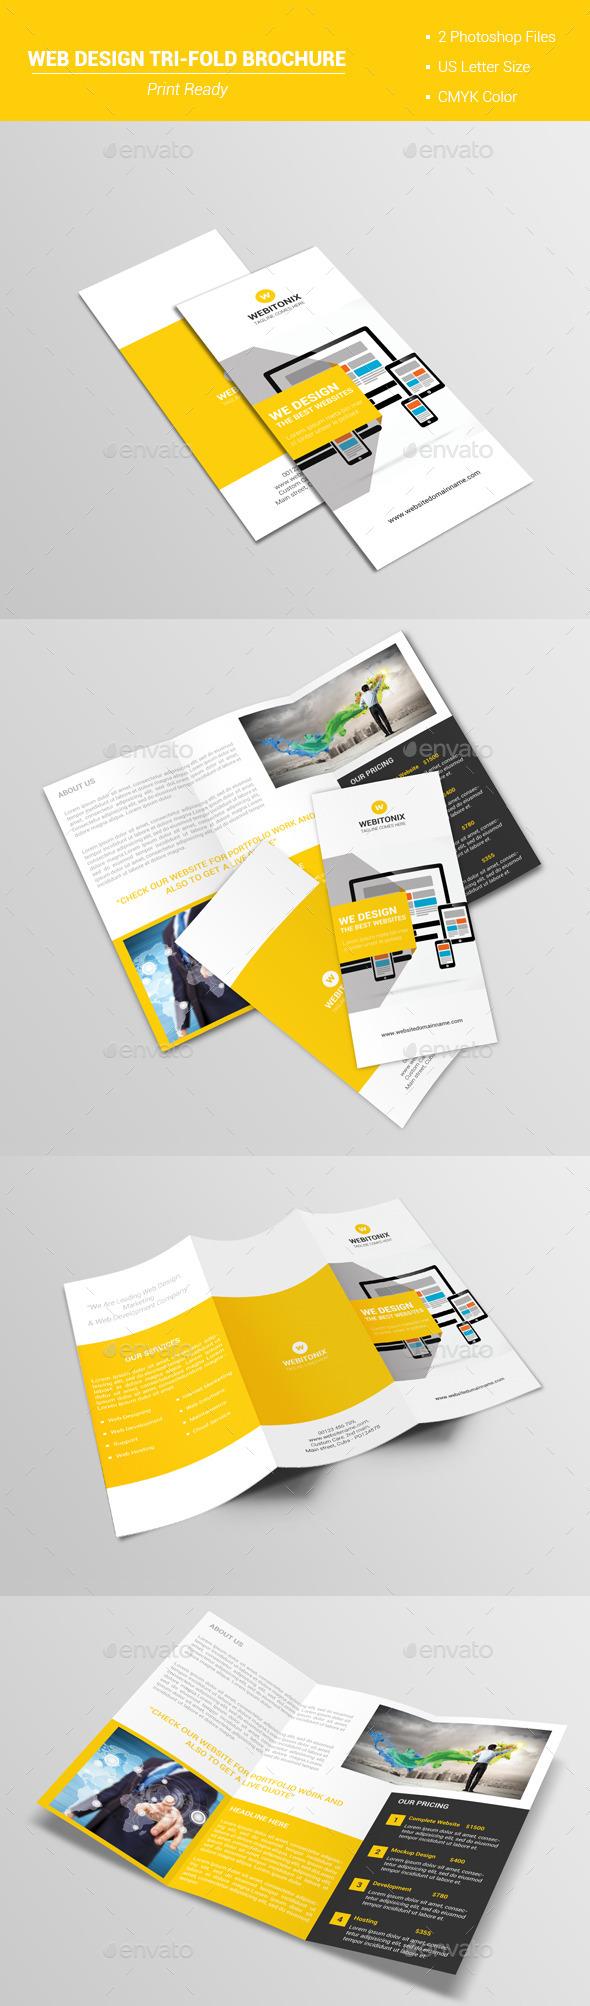 Web Design Tri-Fold Brochure V1 - Corporate Brochures